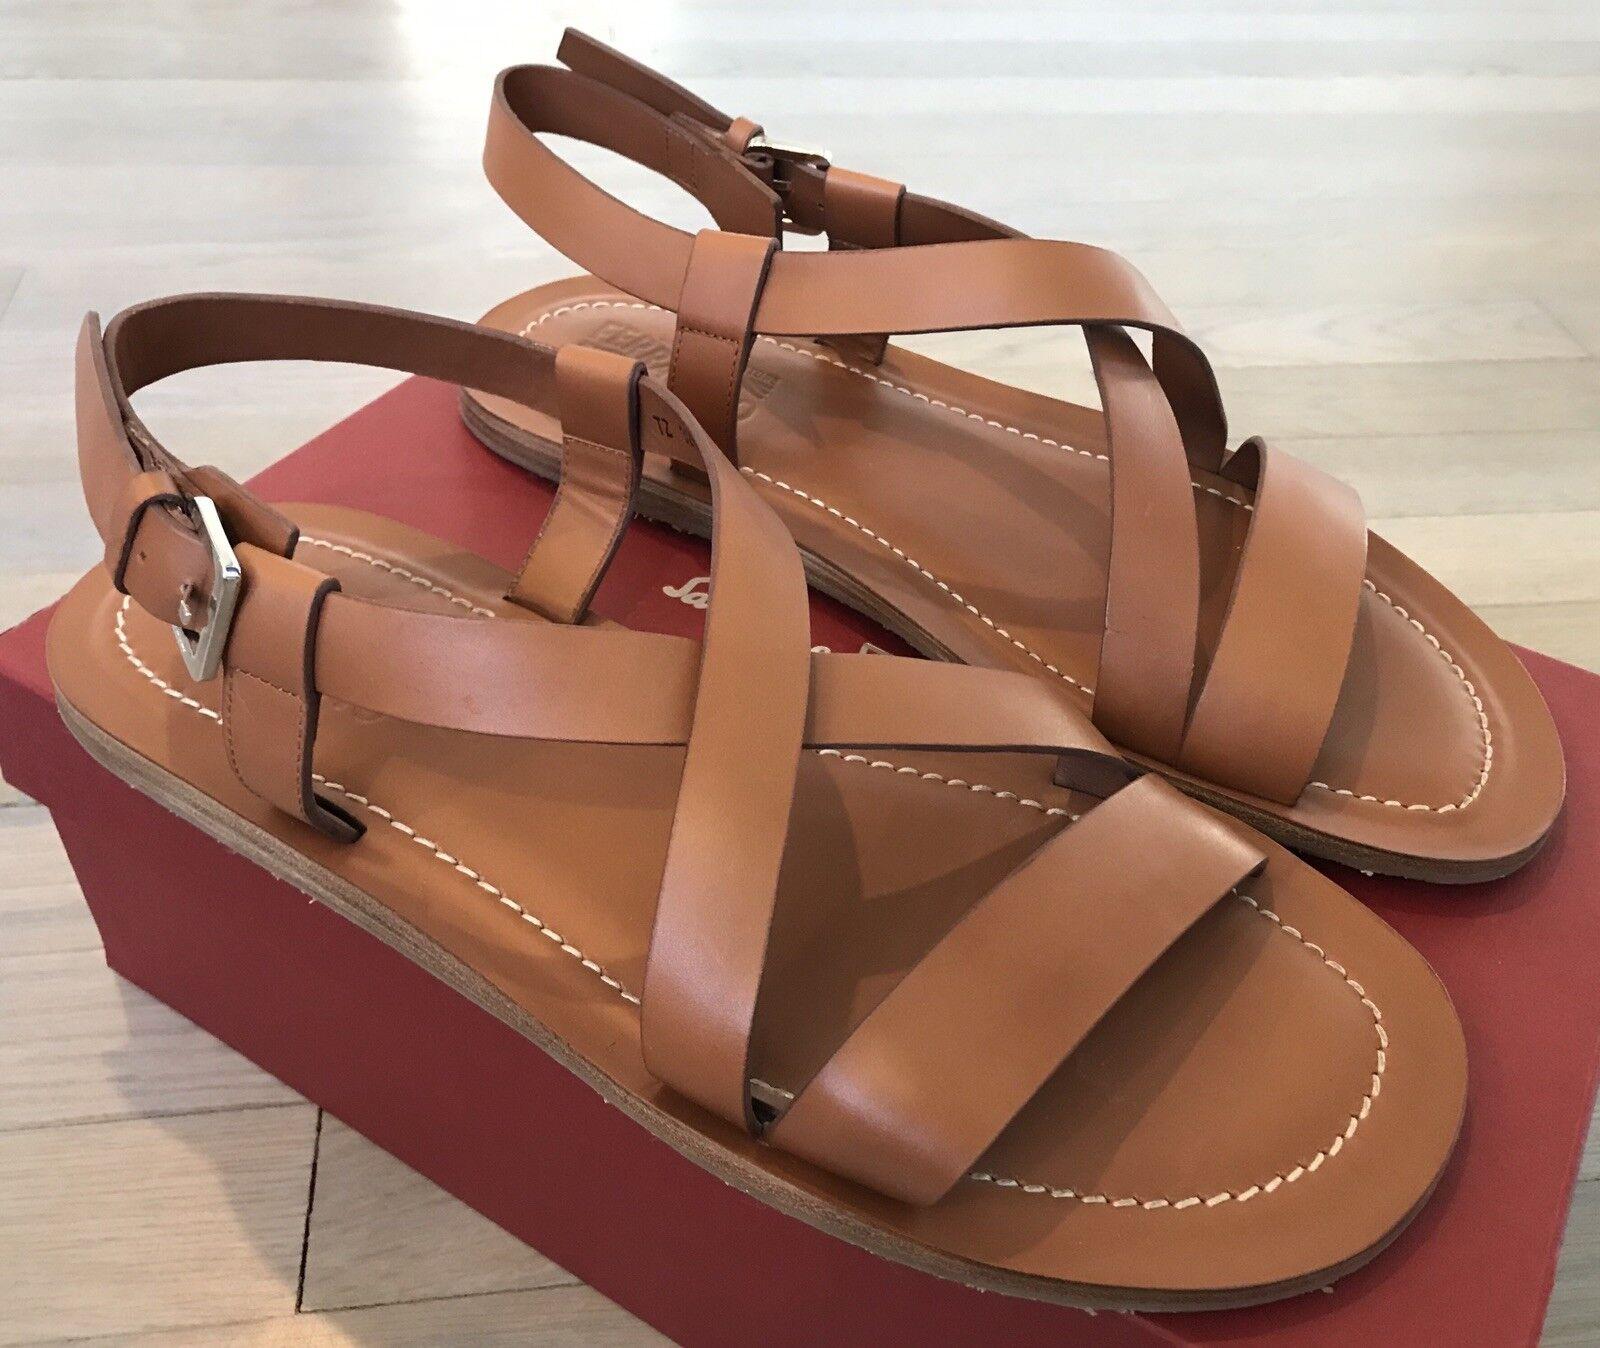 650  Salvatore Ferragamo Nostro Khaki Leather Sandals Size US 12 Made in